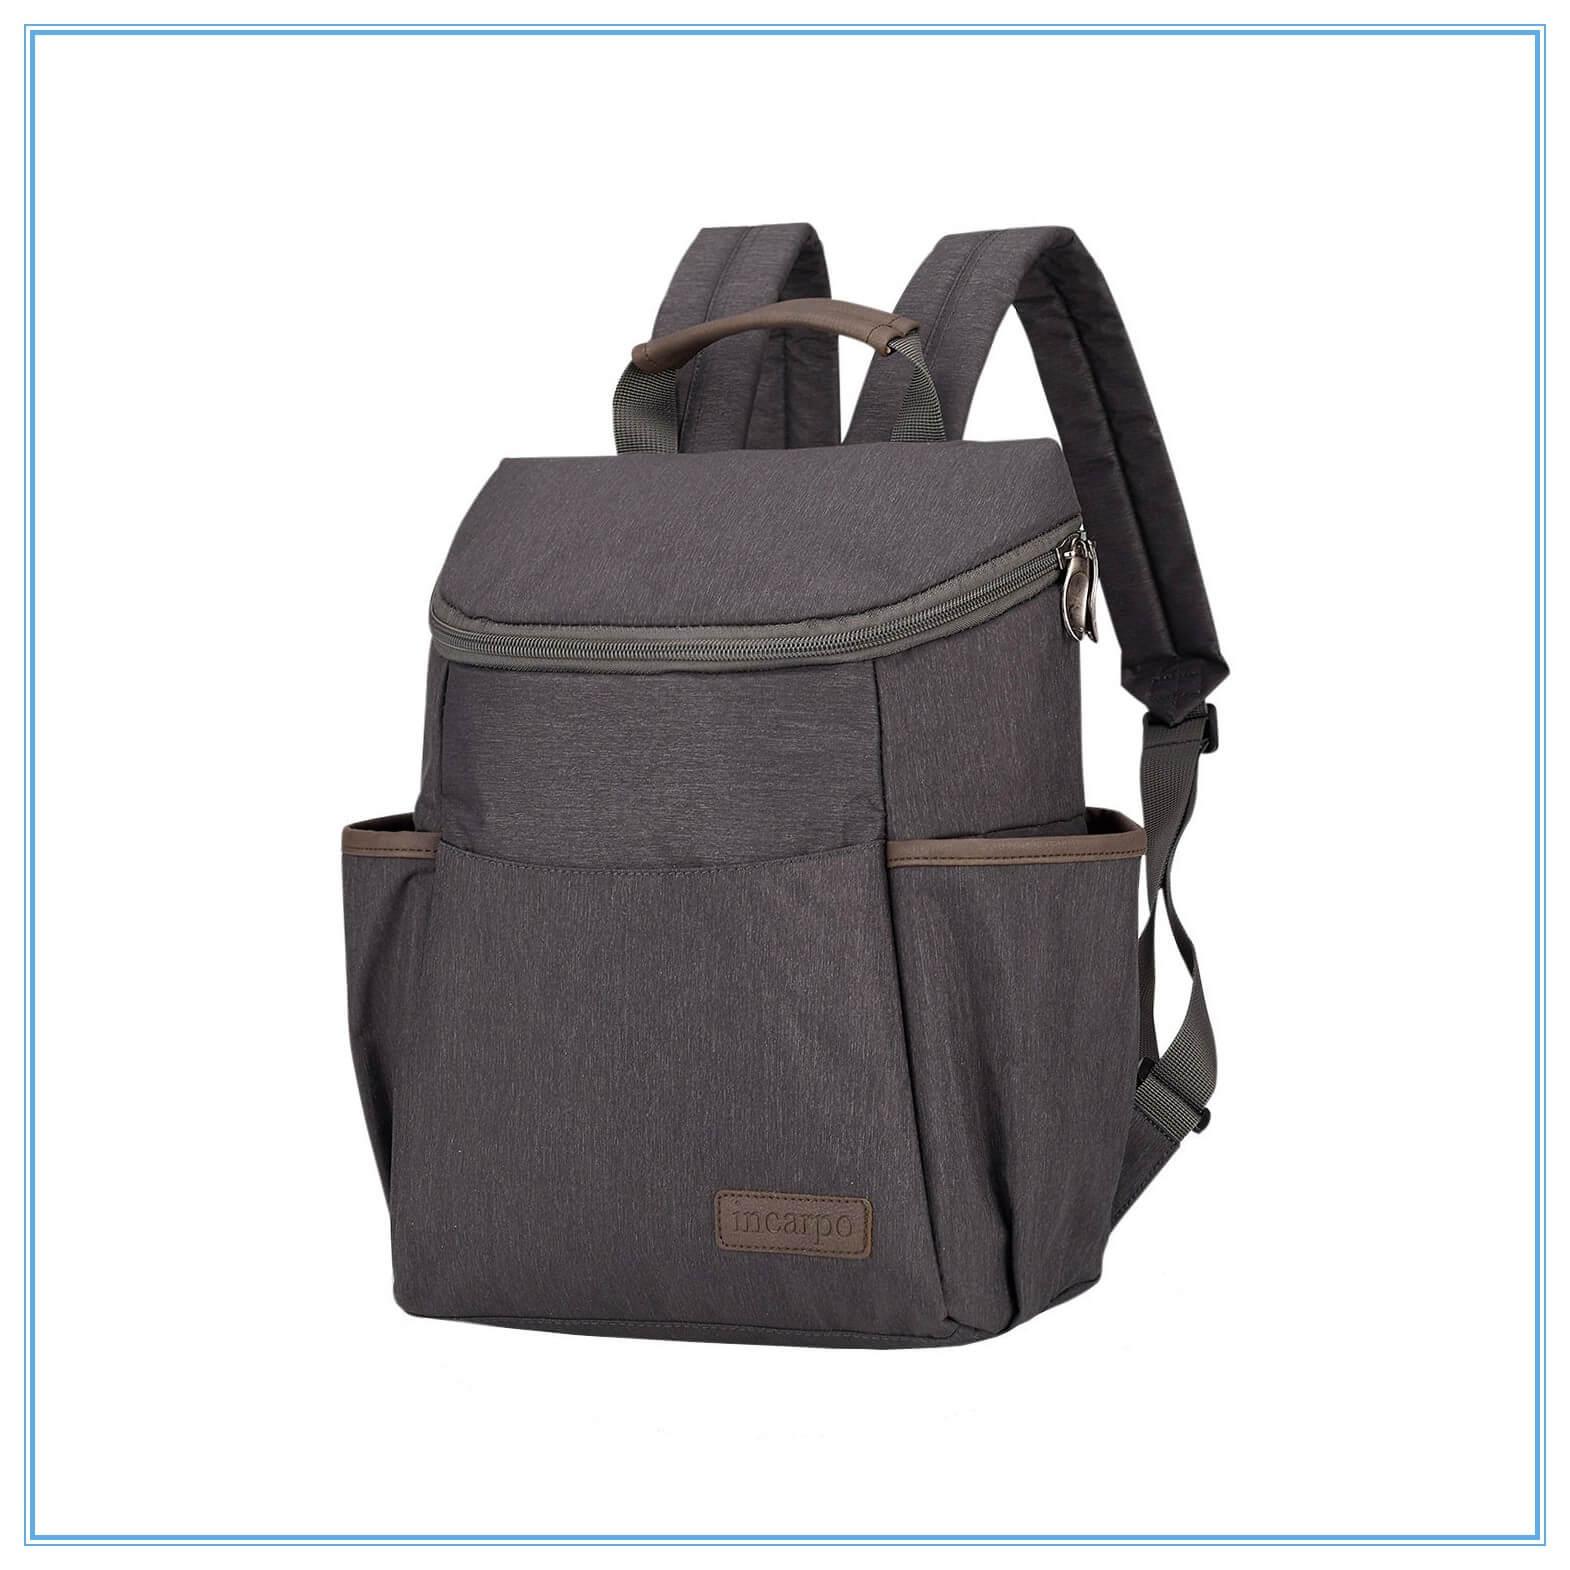 Large Capacity Nappy Bag